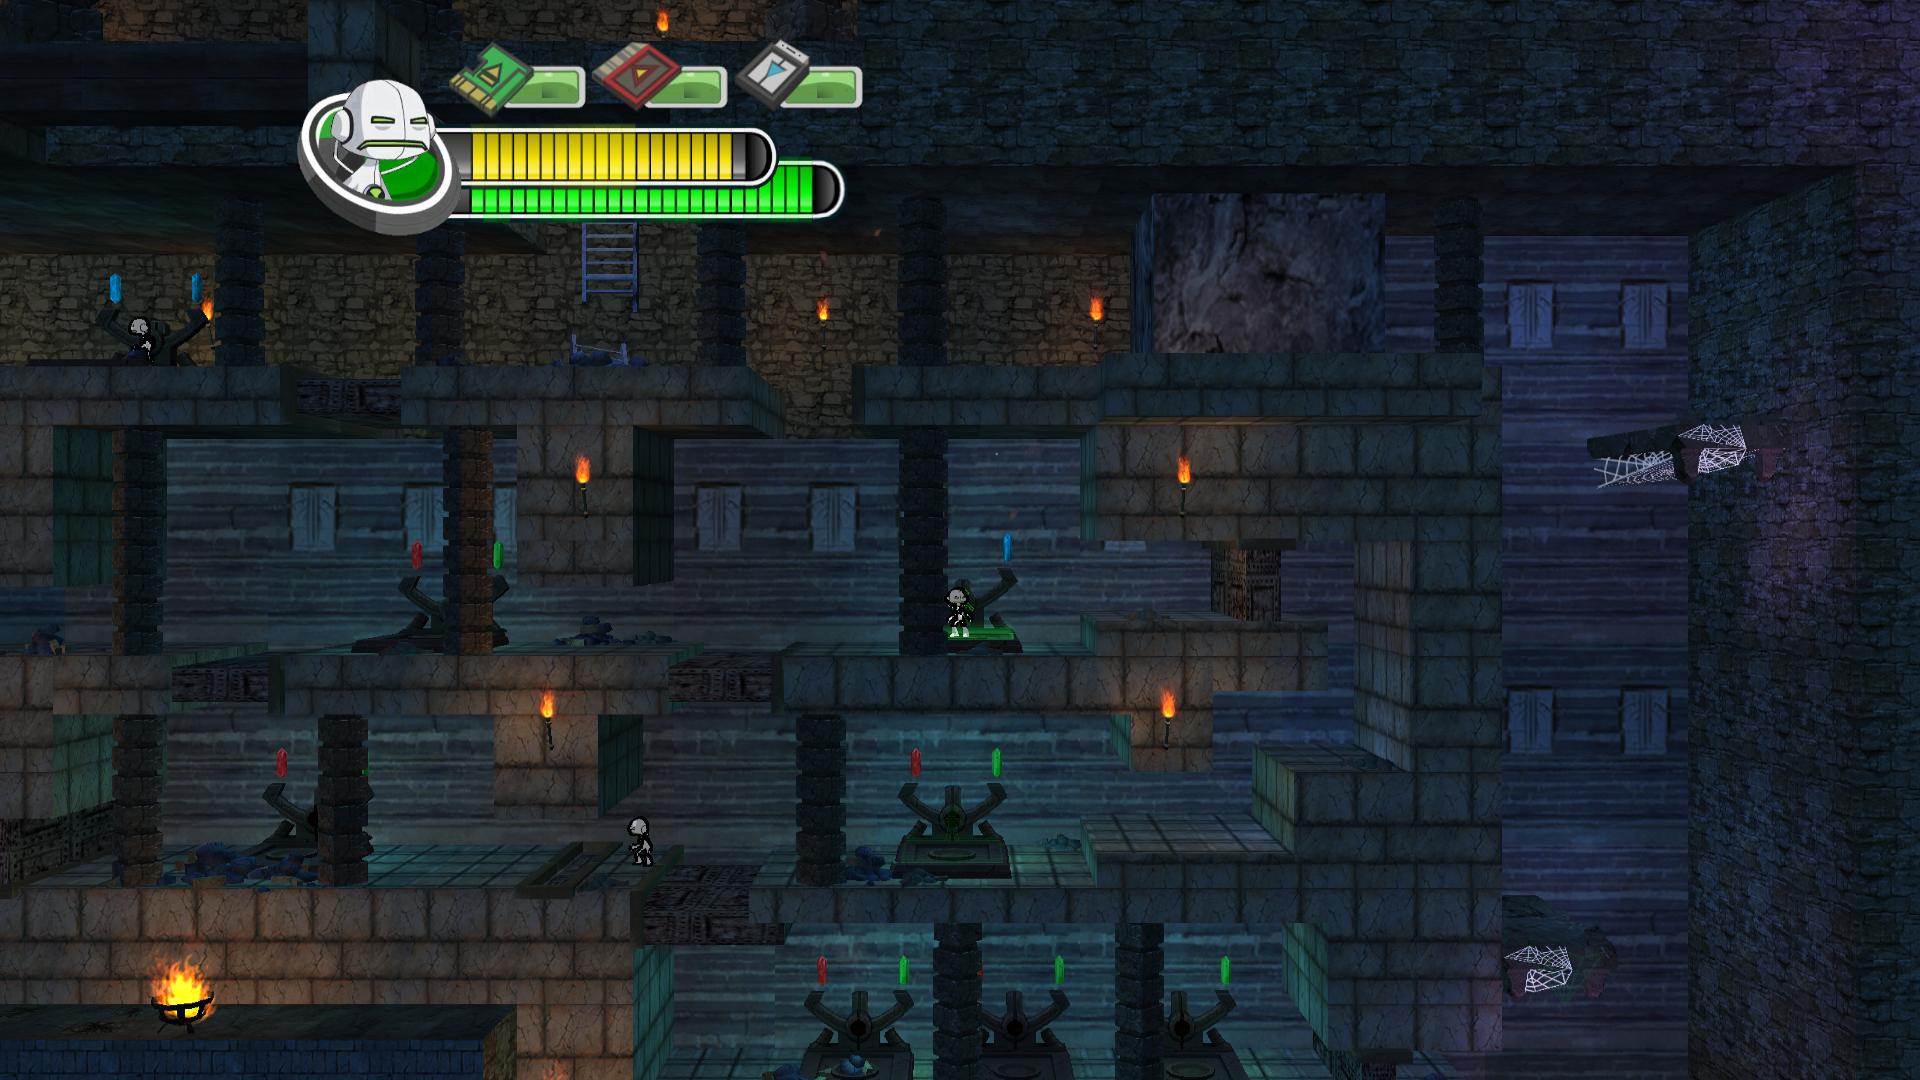 Ben 10 Alien Force: The Rise of Hex Screenshot